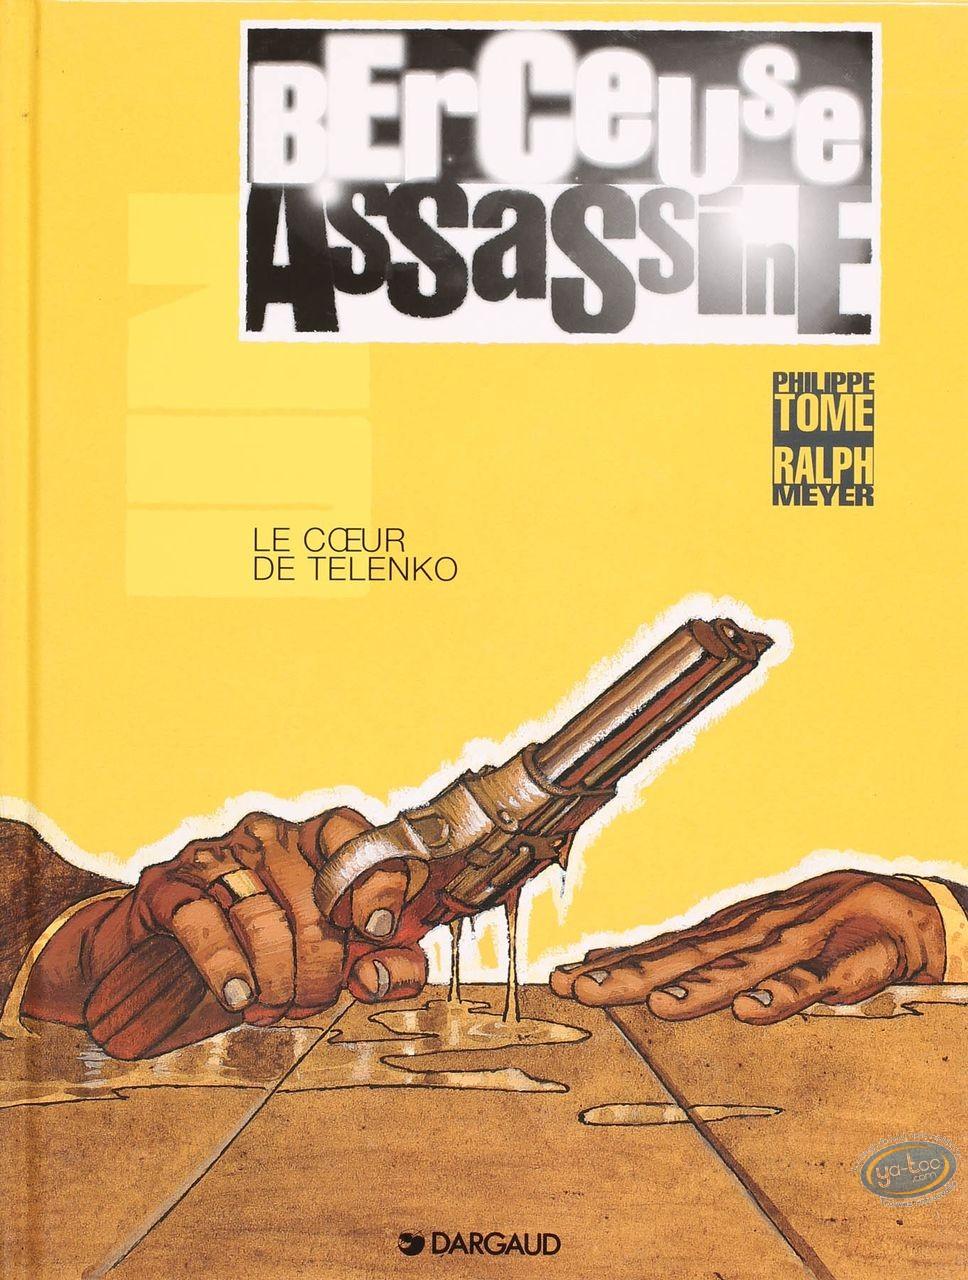 Listed European Comic Books, Berceuse Assassine : le Coeur de Telenko